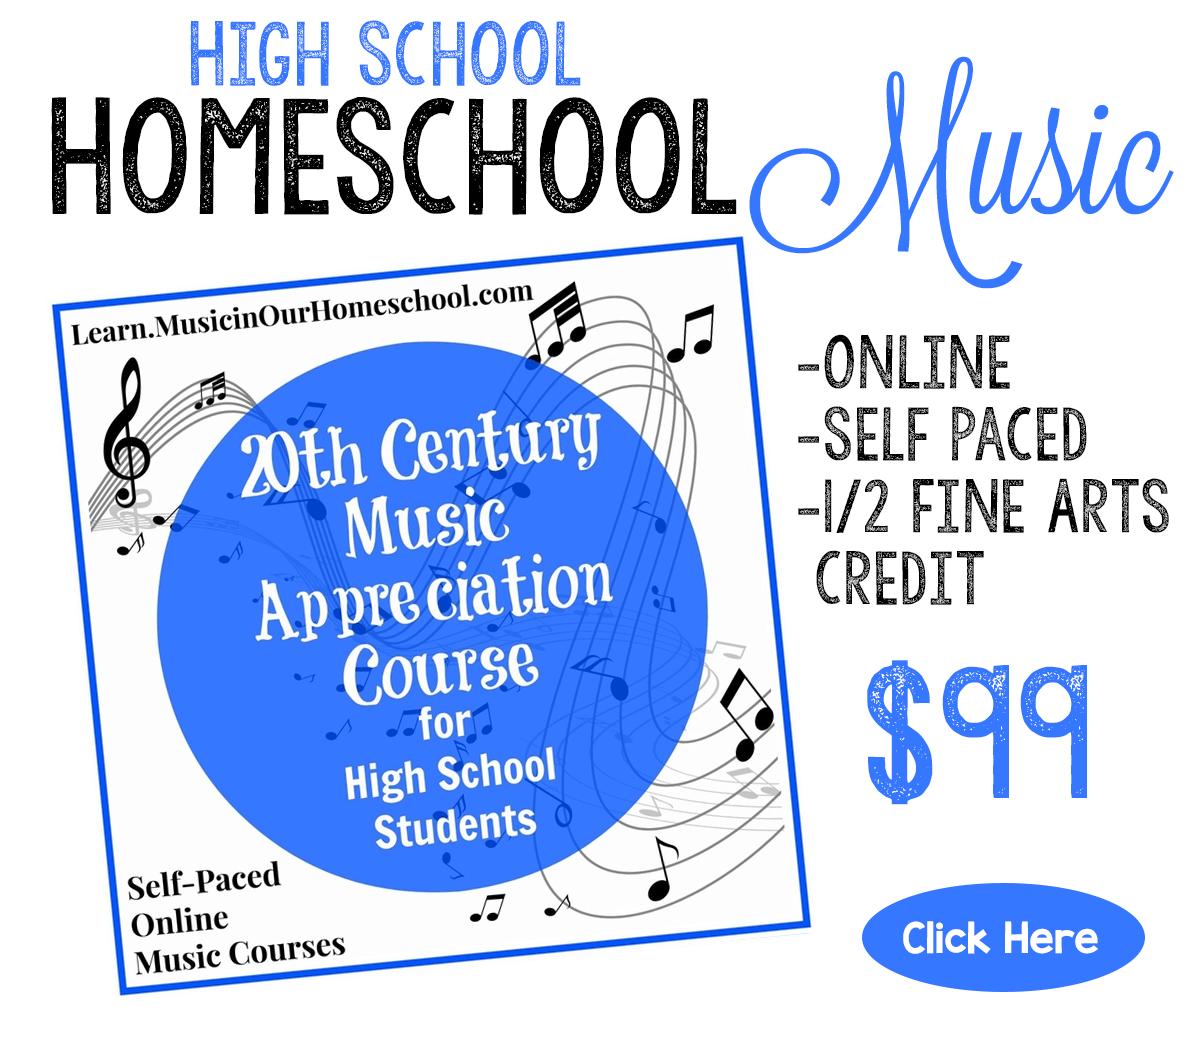 HighSchoolMusicCourse